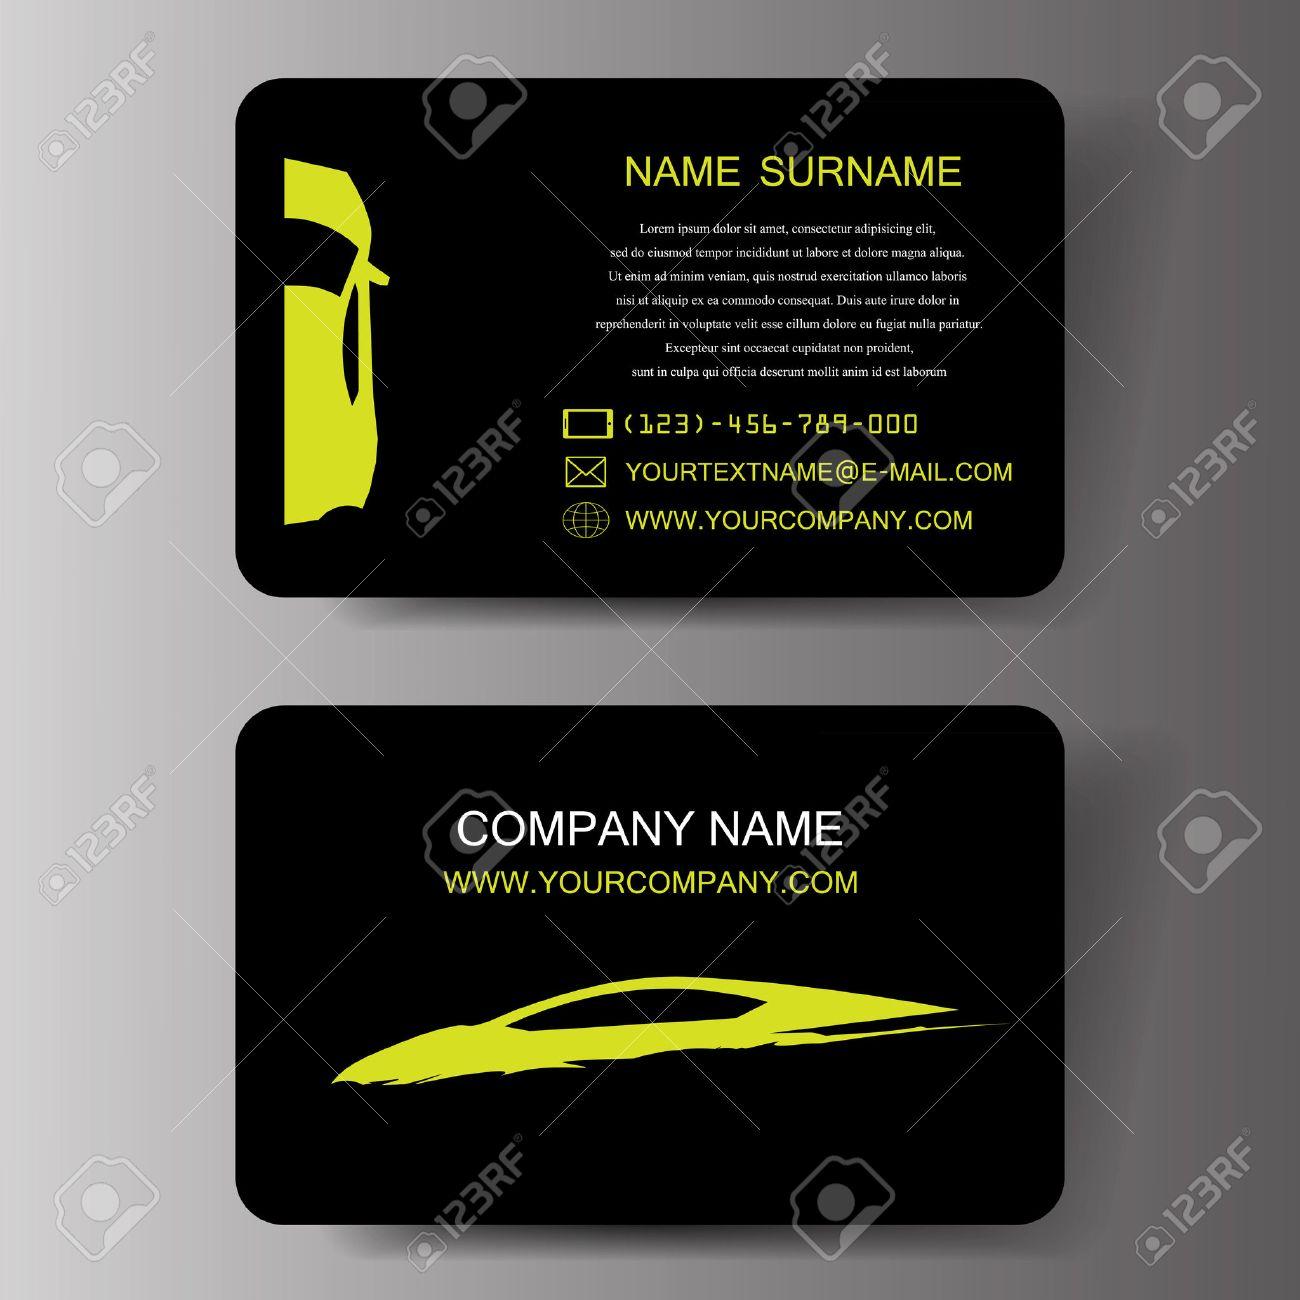 Car business cards illustration royalty free cliparts vectors and car business cards illustration stock vector 22445894 colourmoves